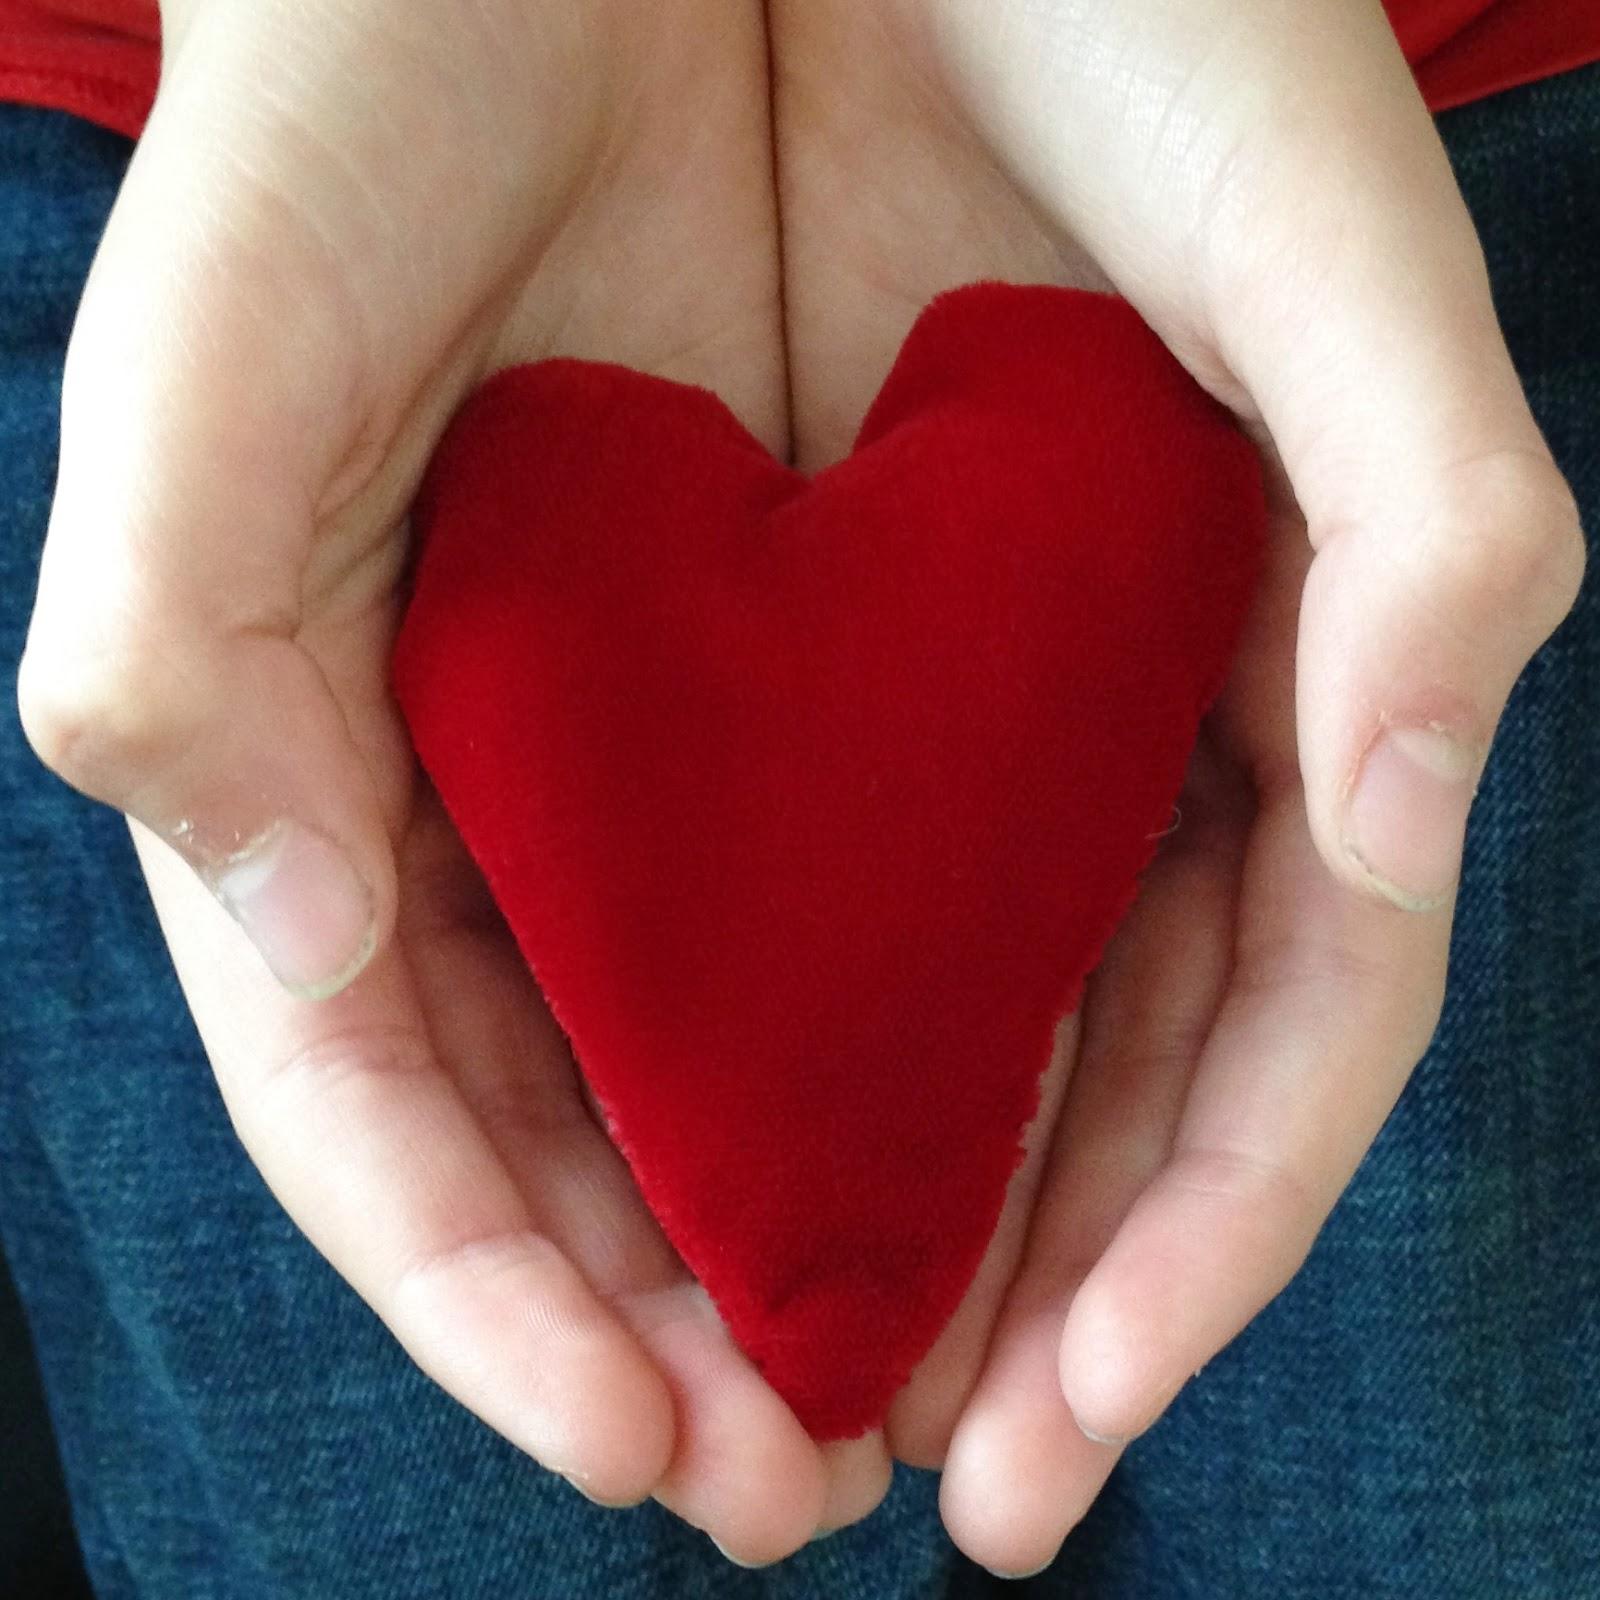 http://webloomhere.blogspot.com/2014/03/holding-hearts.html